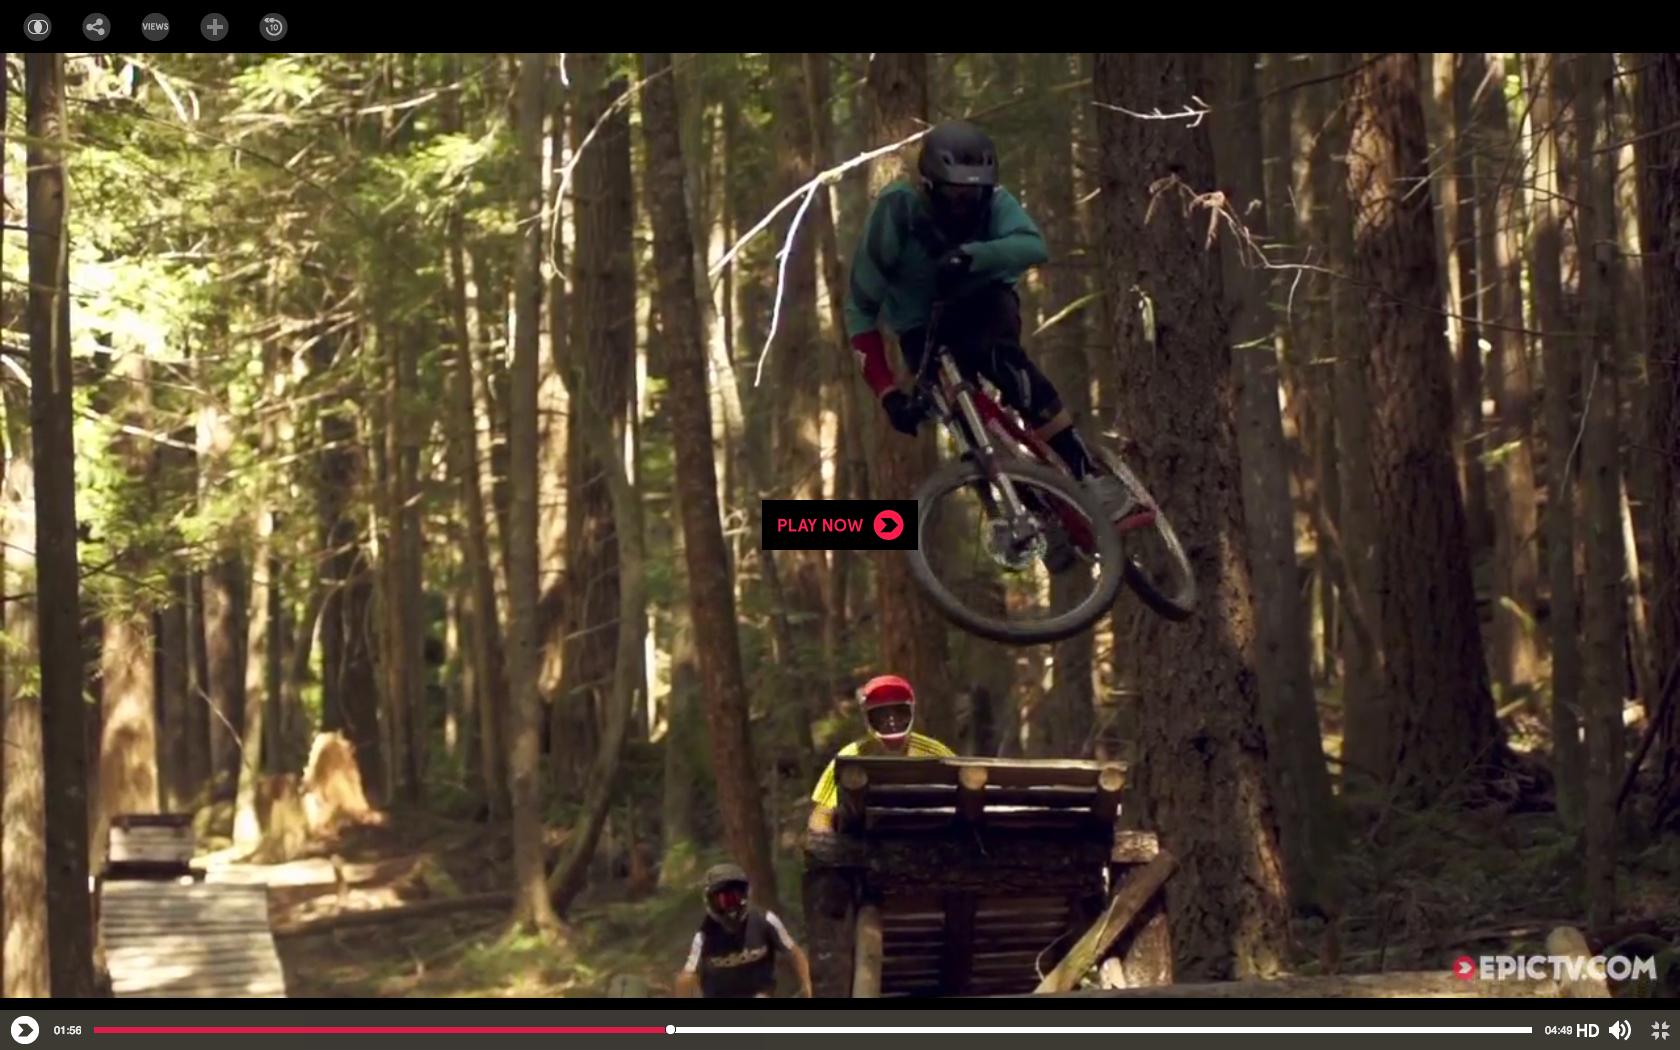 Video: Beyond The Bikepark In Whistler